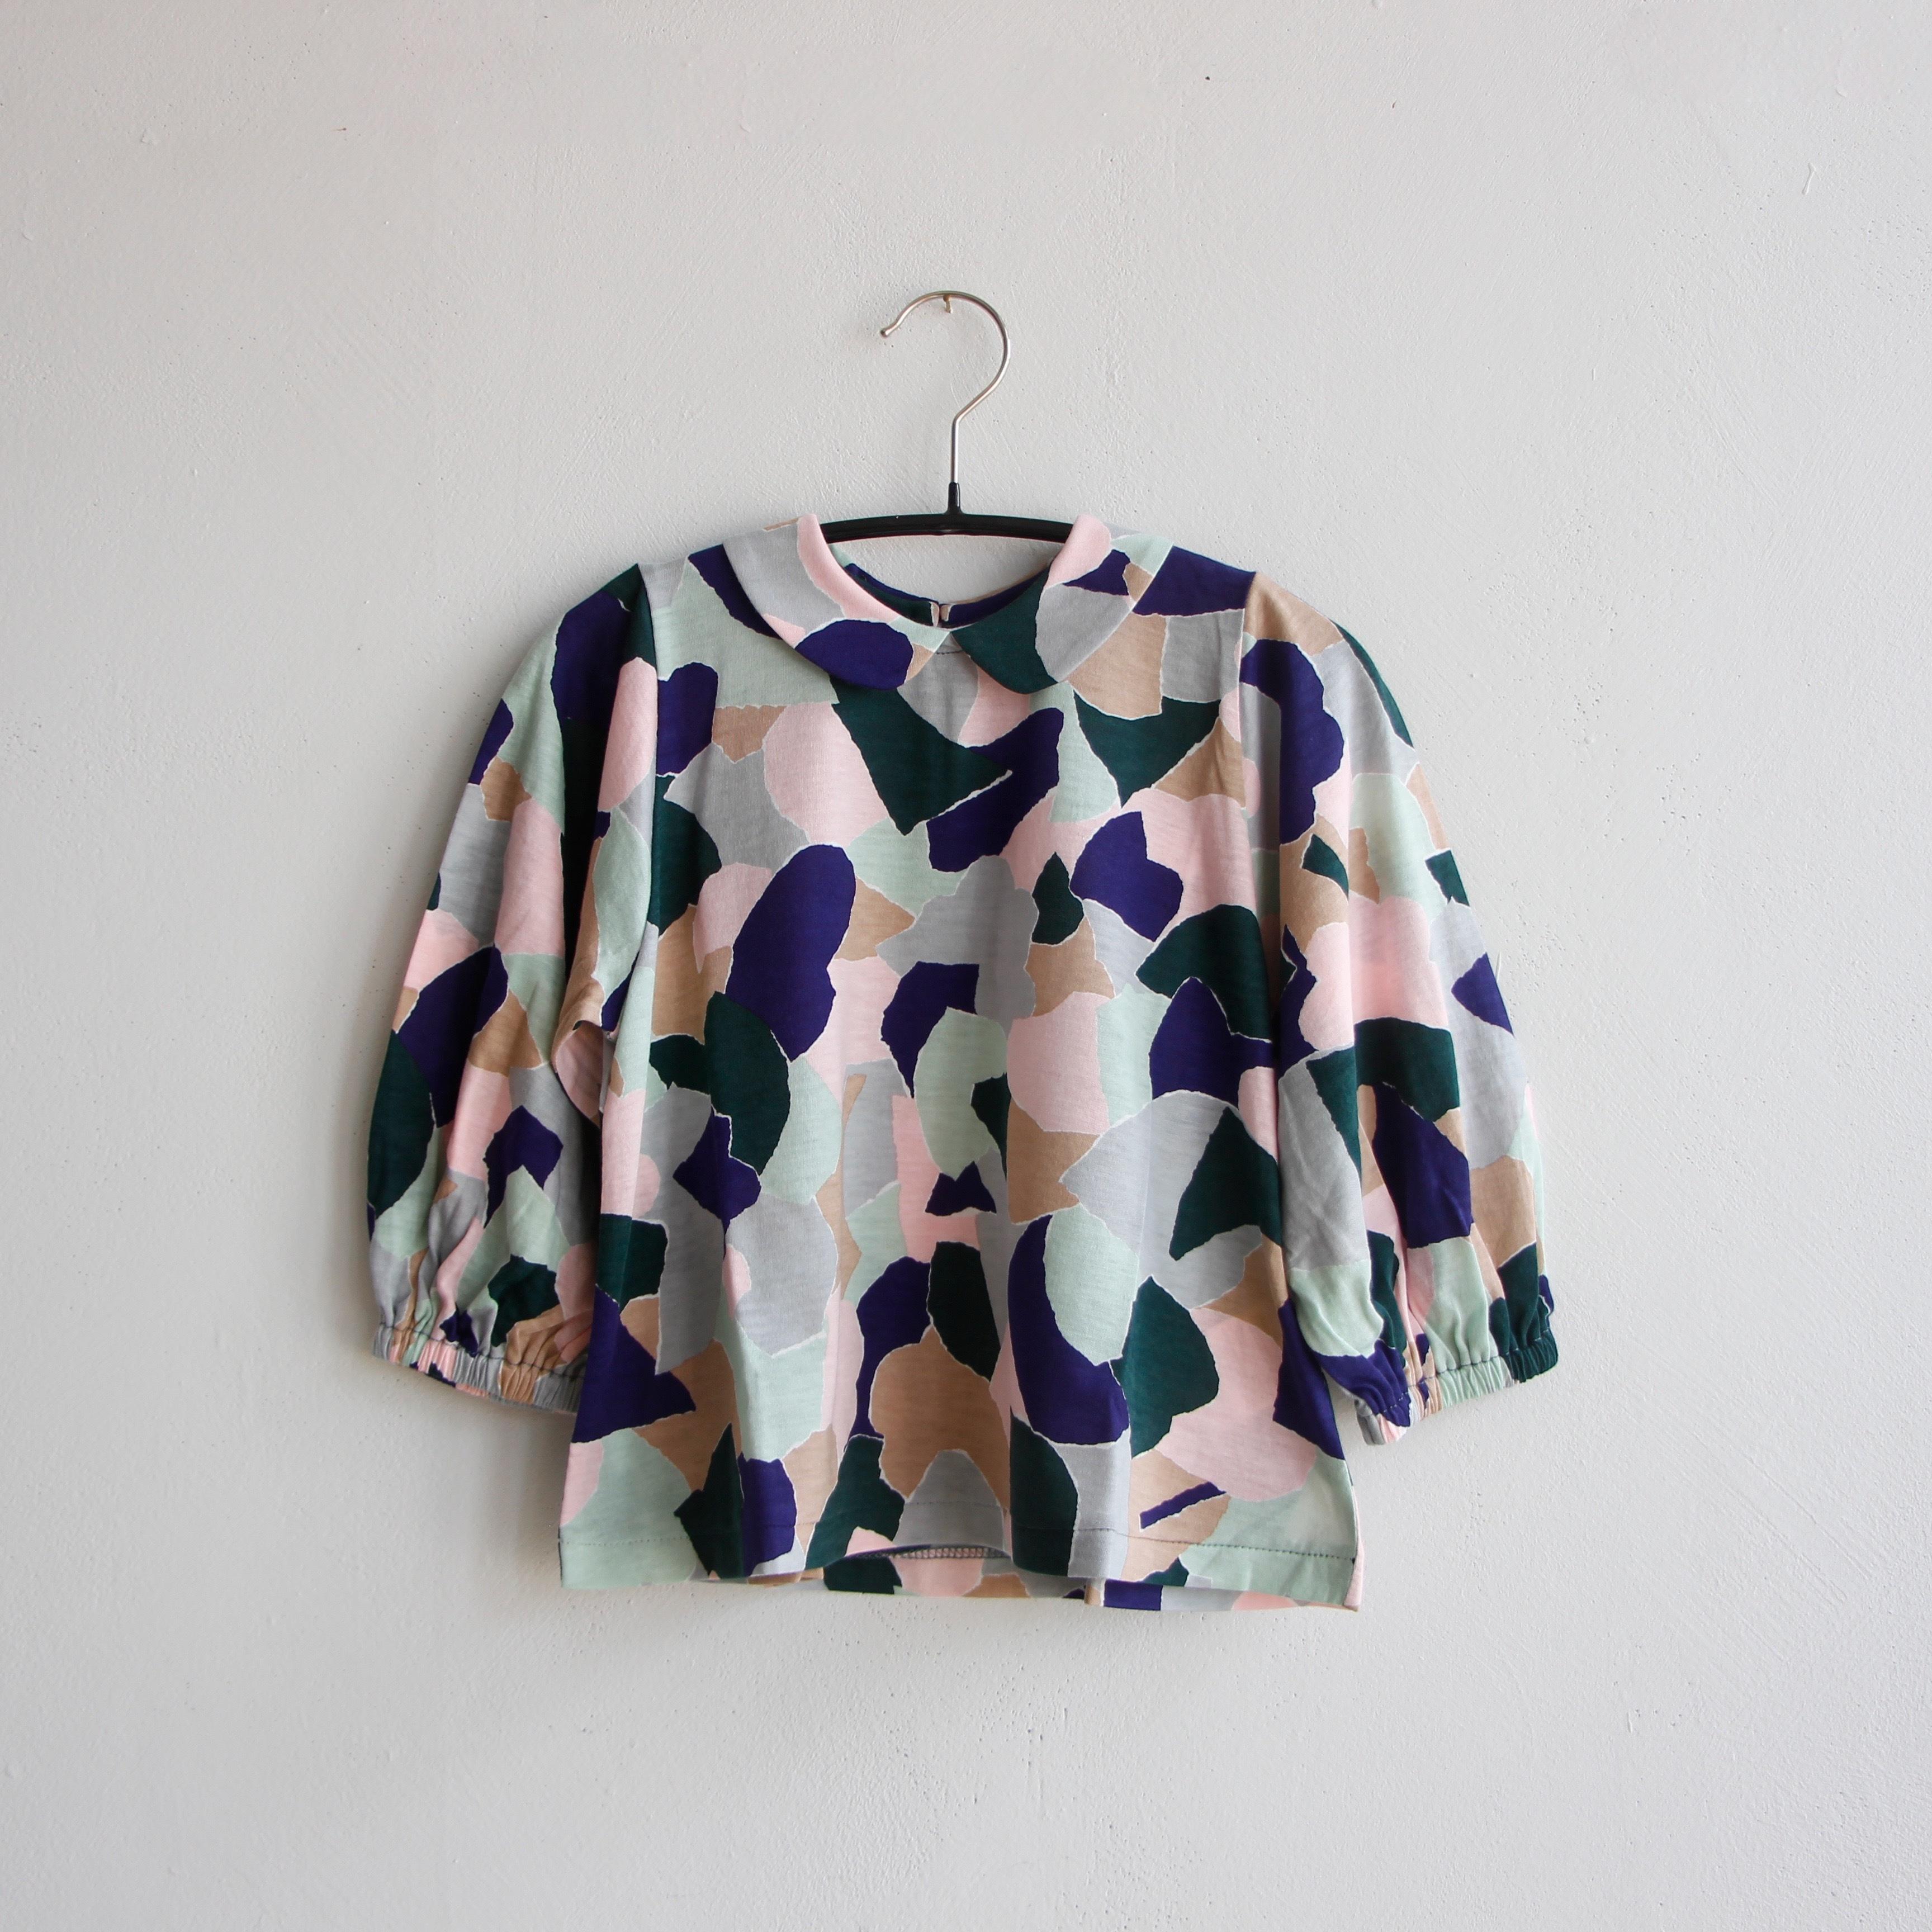 《mina perhonen 2020AW》foliage 長袖カットソー / pink mix / 80-100cm